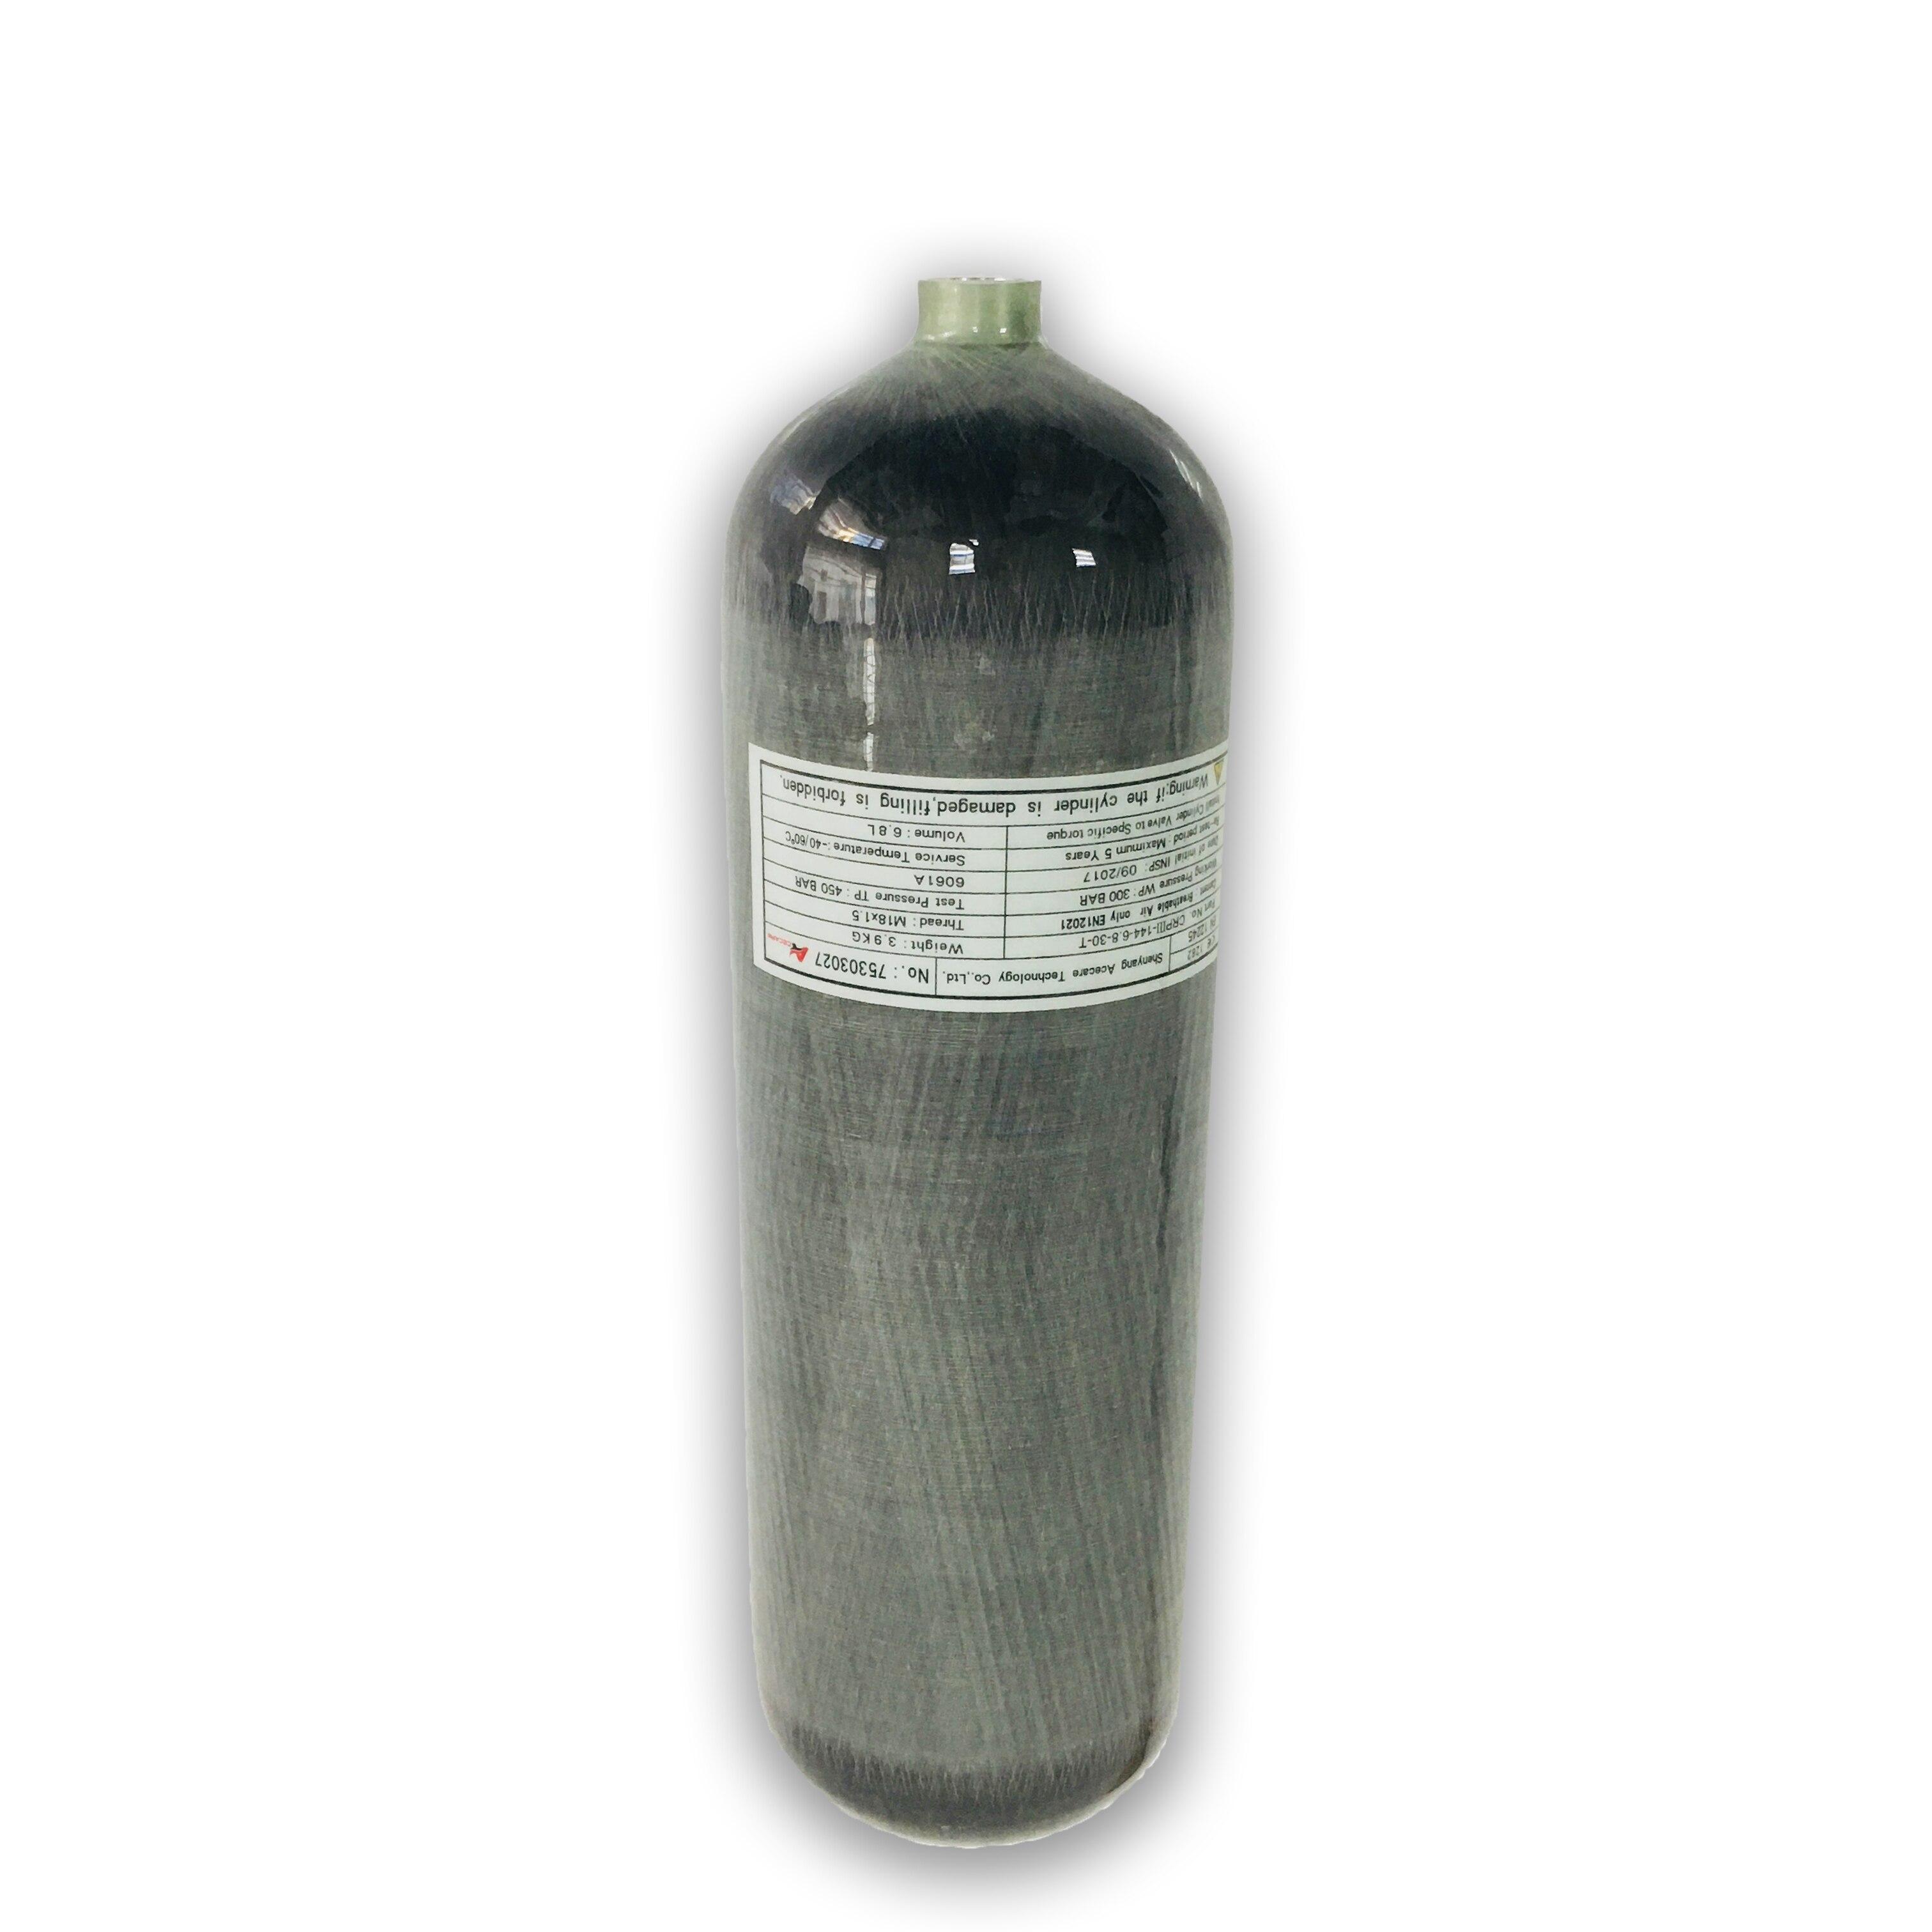 AC168 Pcp Air Rifle SCUBA Cylinder Carbon Fiber 6.8L Scba Tank 4500Psi M18*1.5 Thread